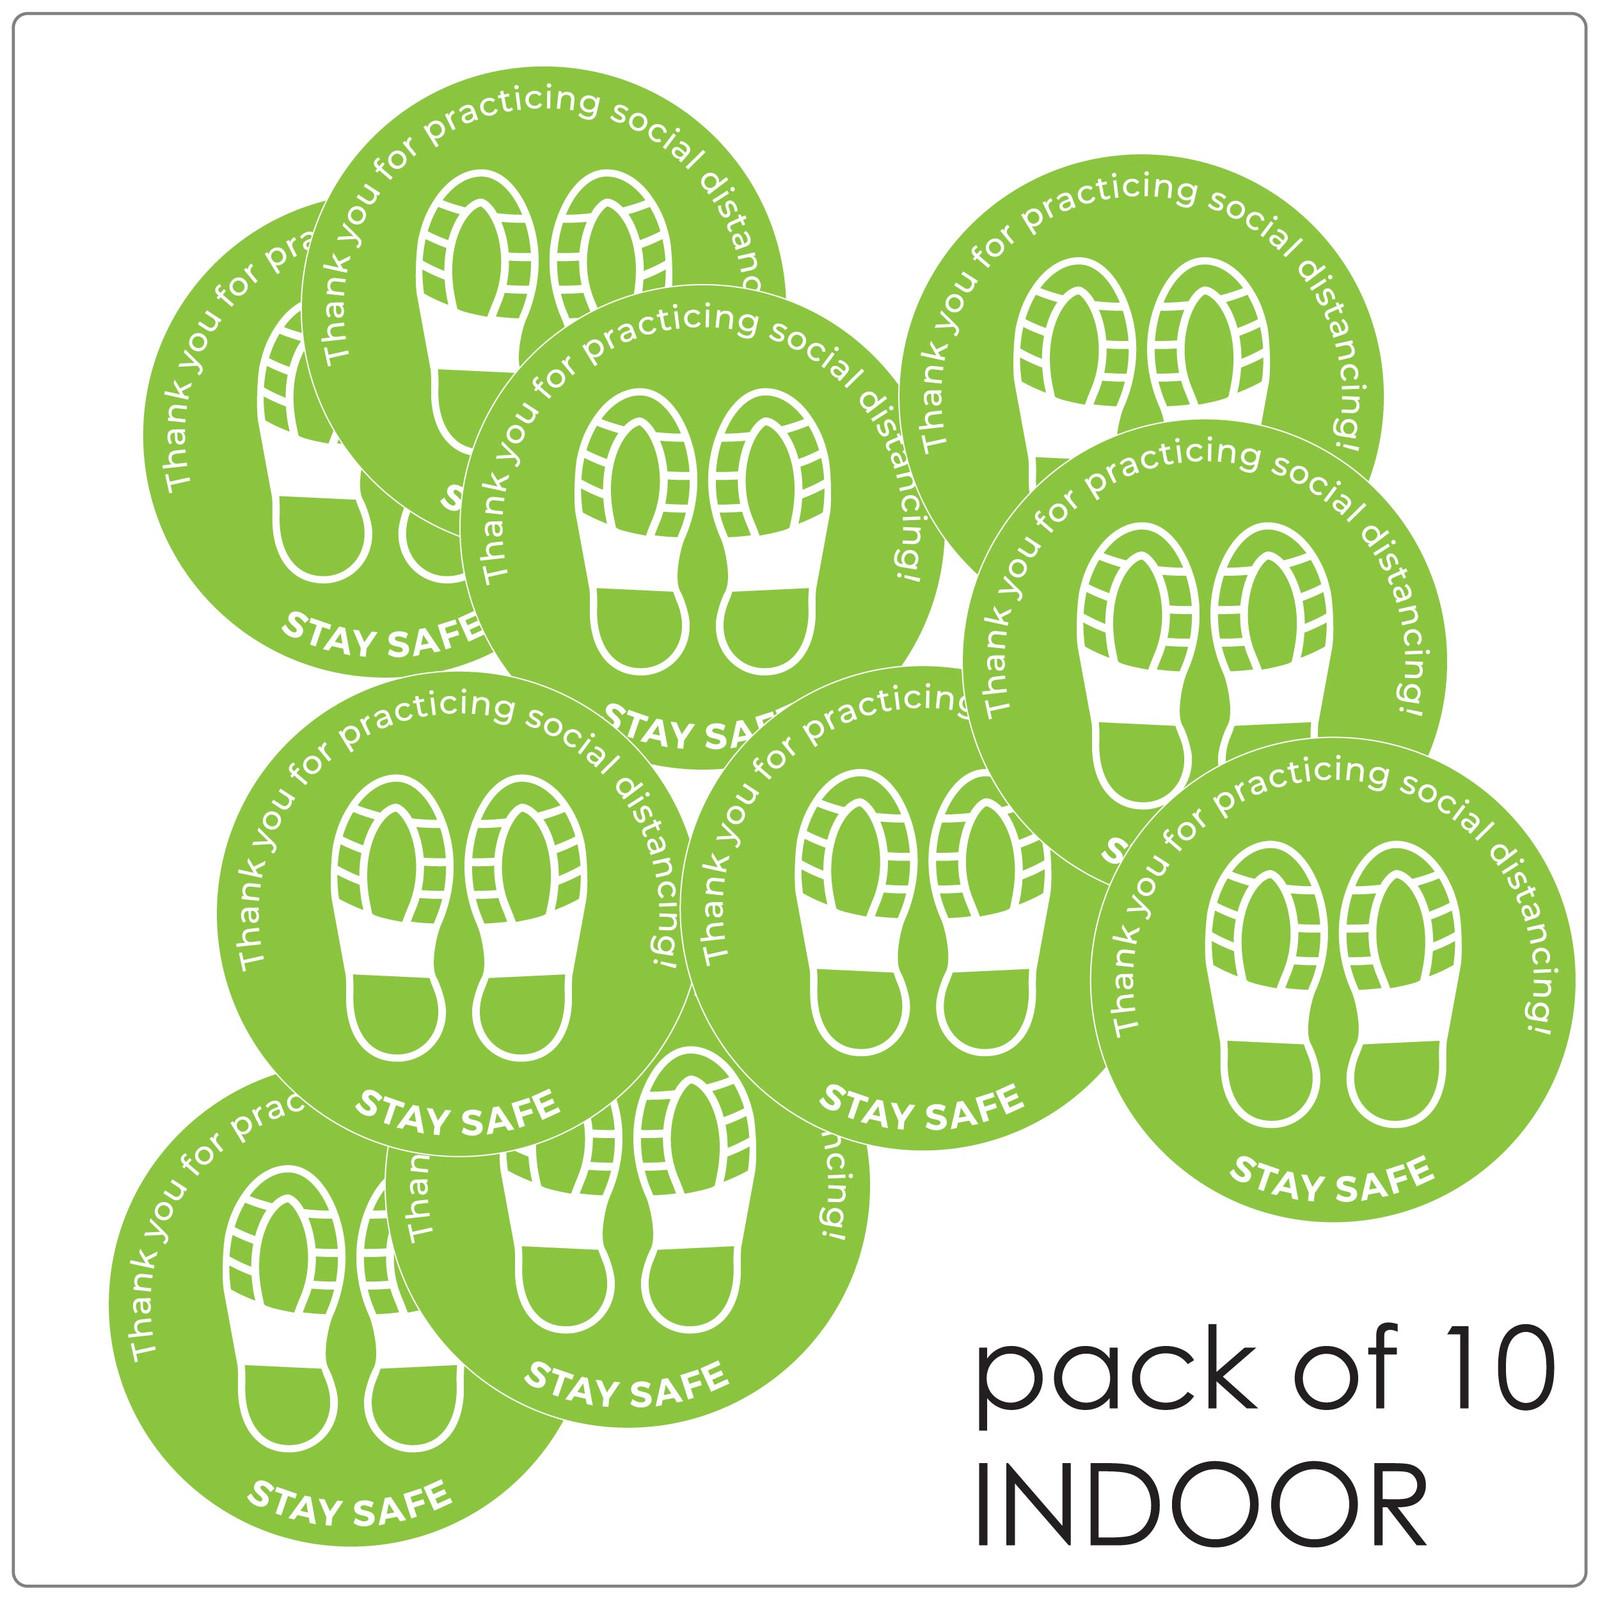 social distancing floor sticker for hard floors, pack of 10, green Self-adhesive Corona virus floor sticker to help social distancing.